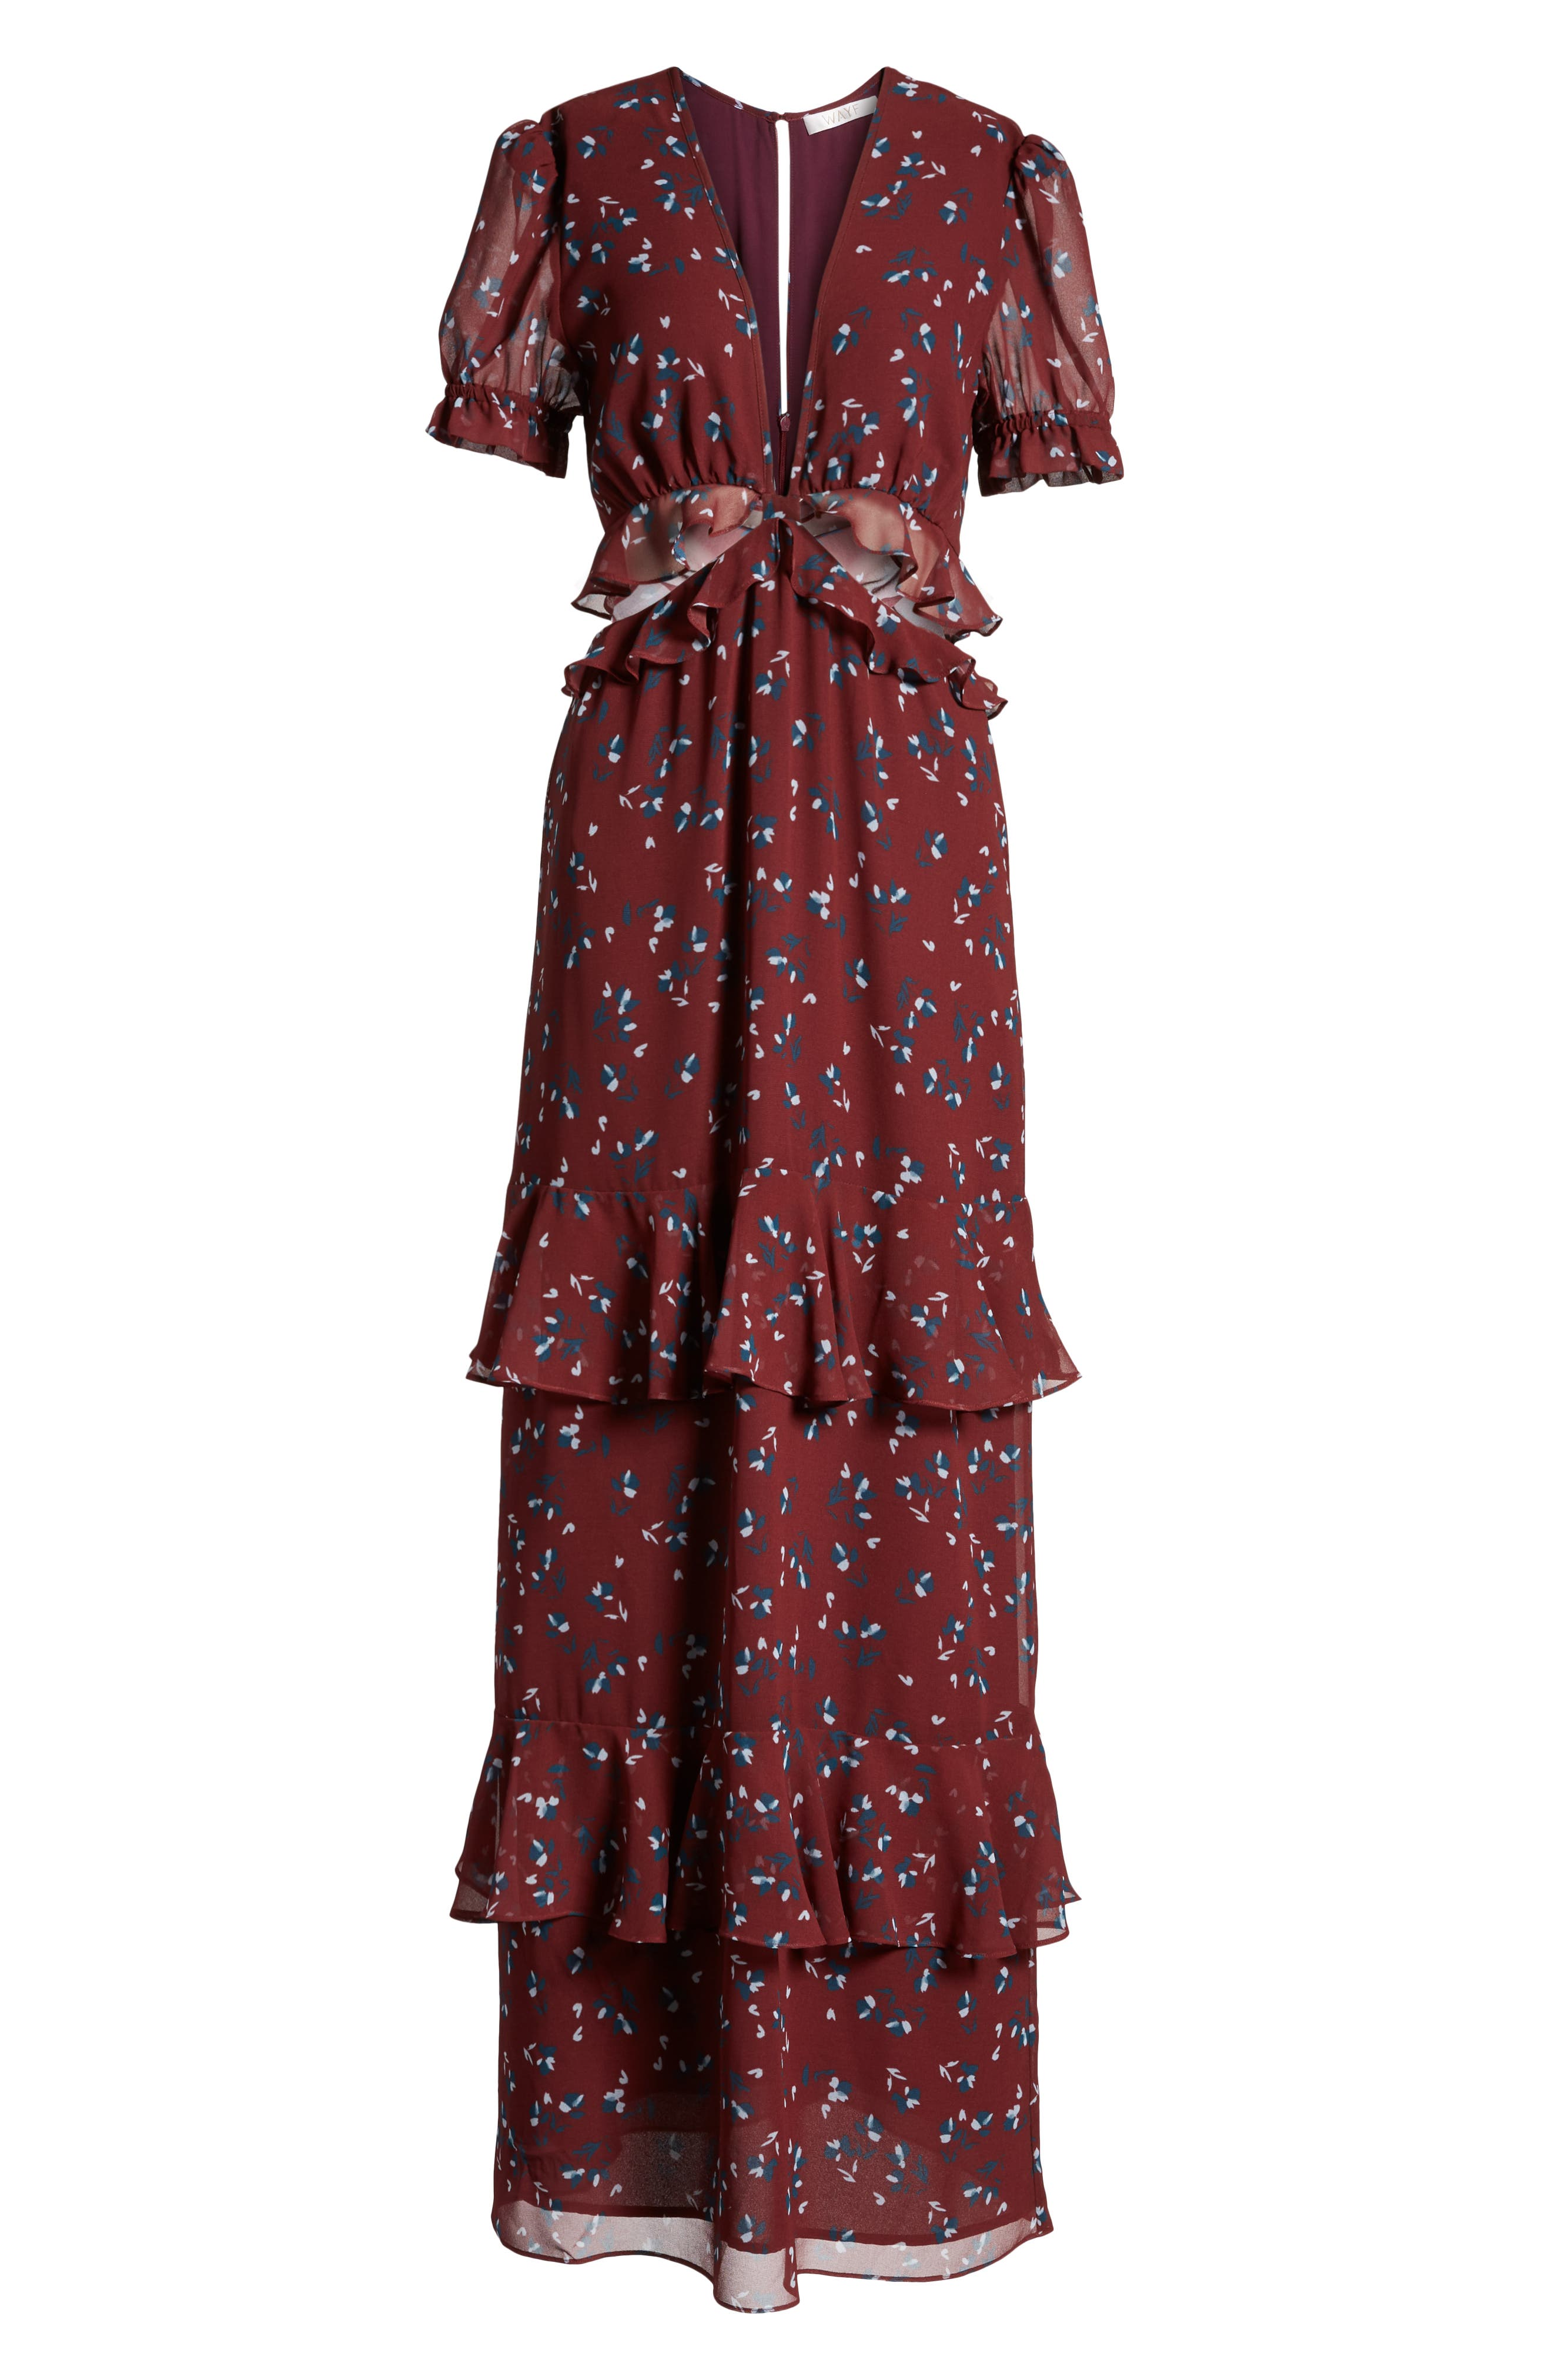 Laviana Maxi Dress,                             Alternate thumbnail 7, color,                             930